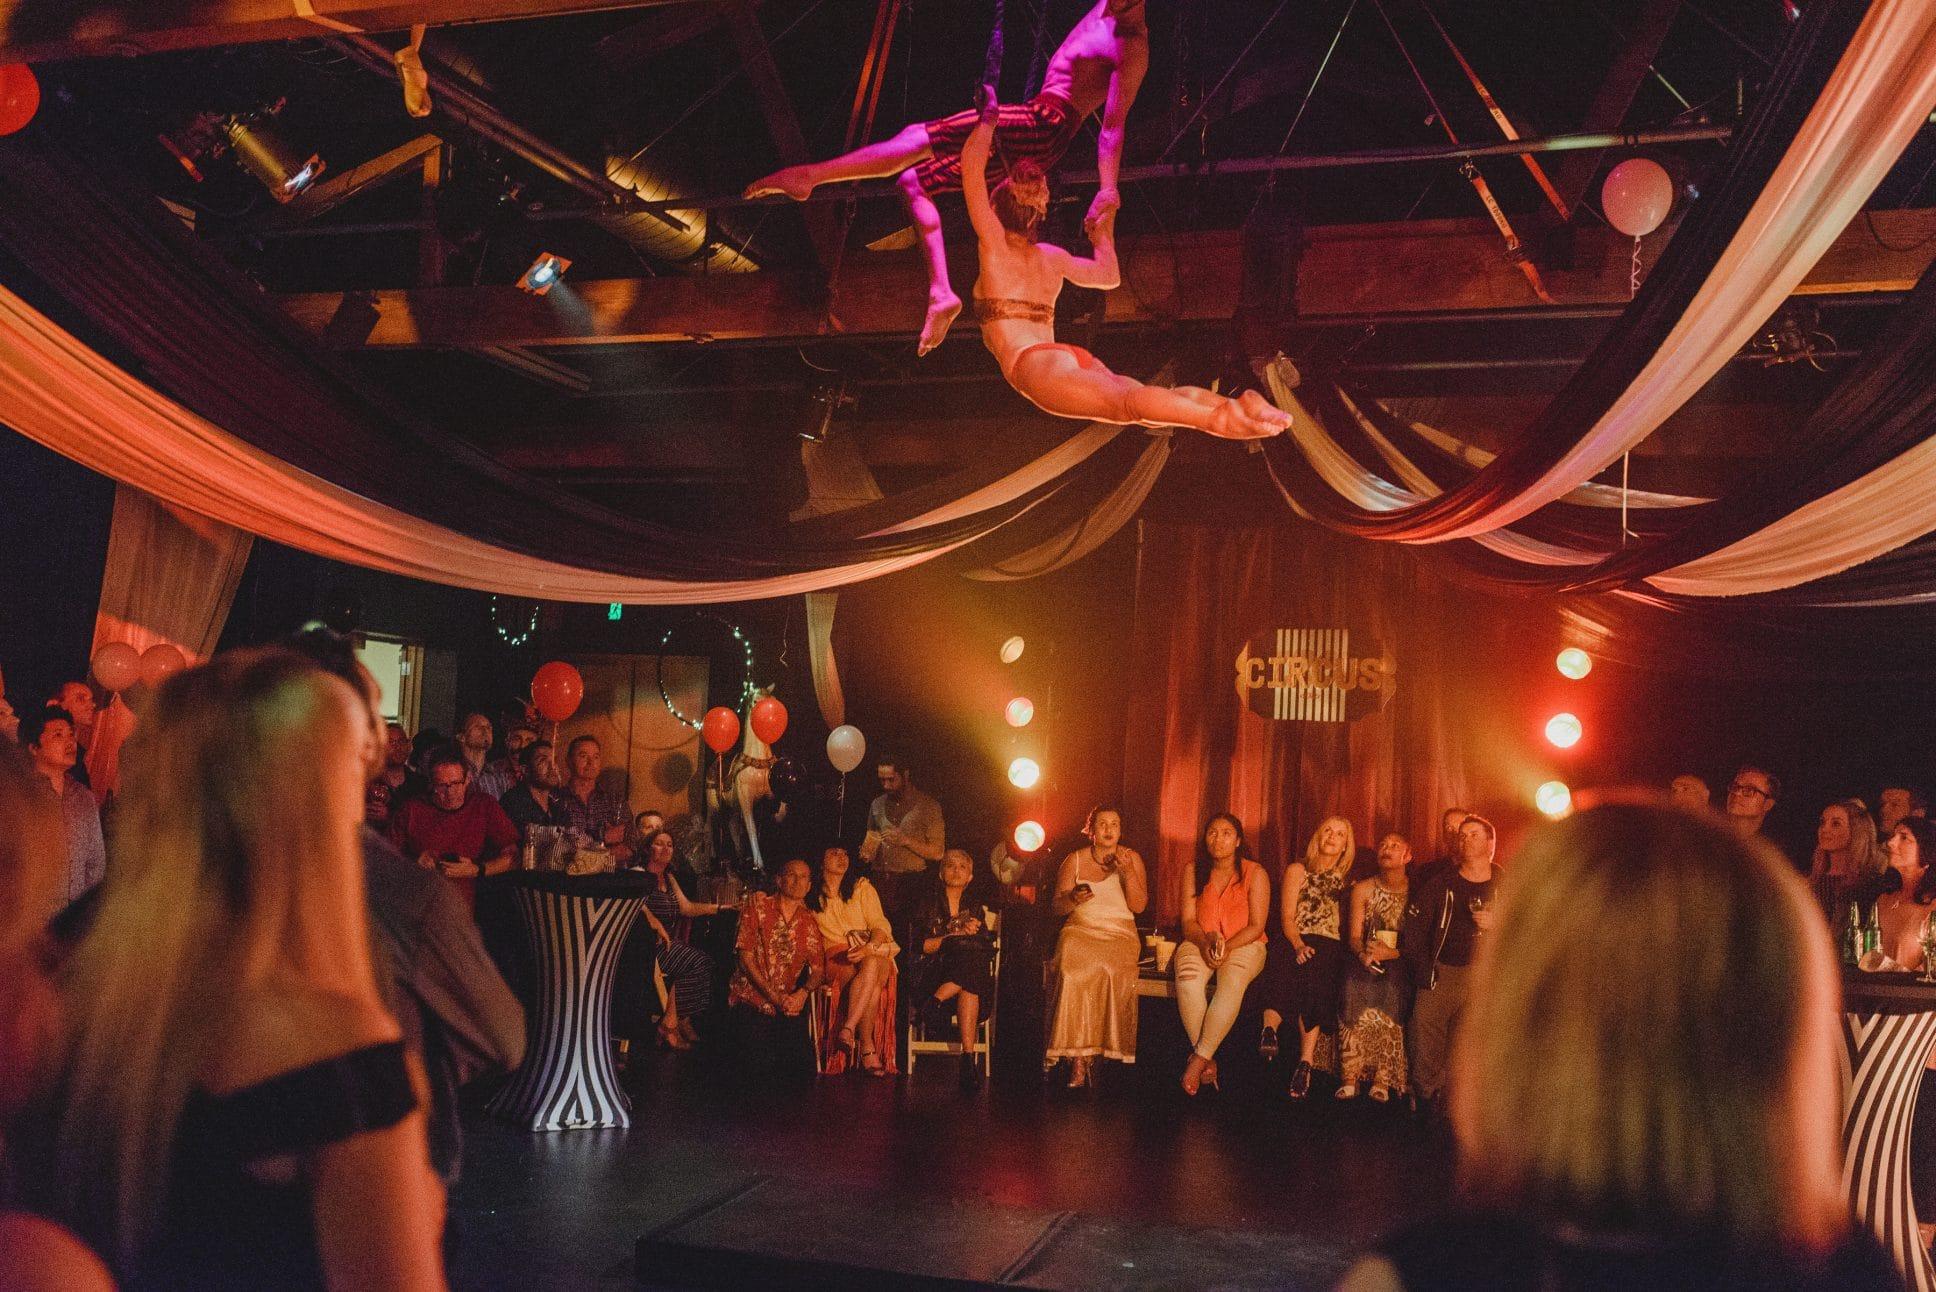 Event space in Auckland called Q Theatre